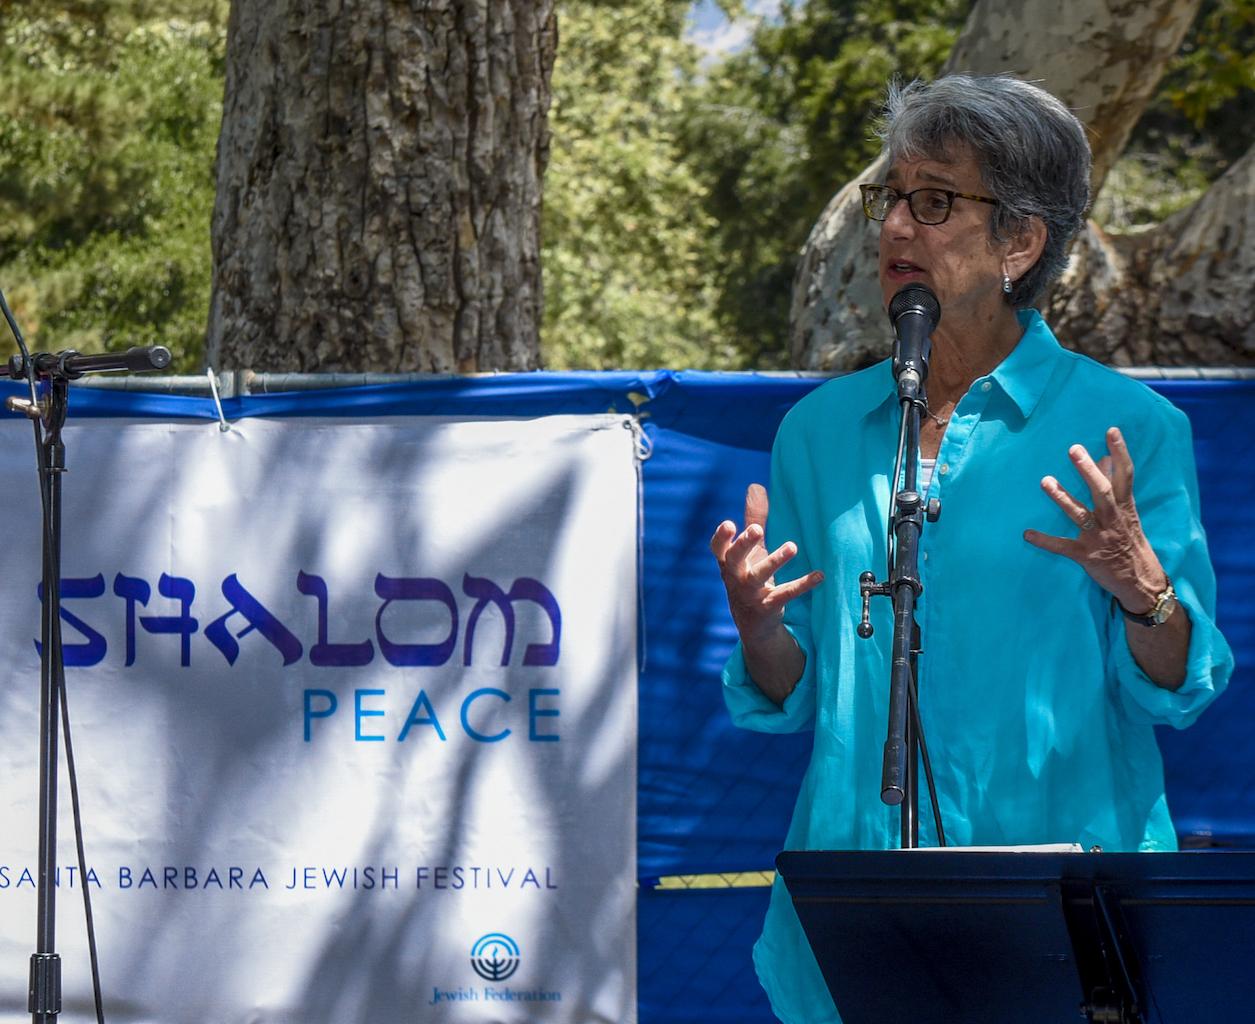 Jewish Federation of Greater Santa Barbara